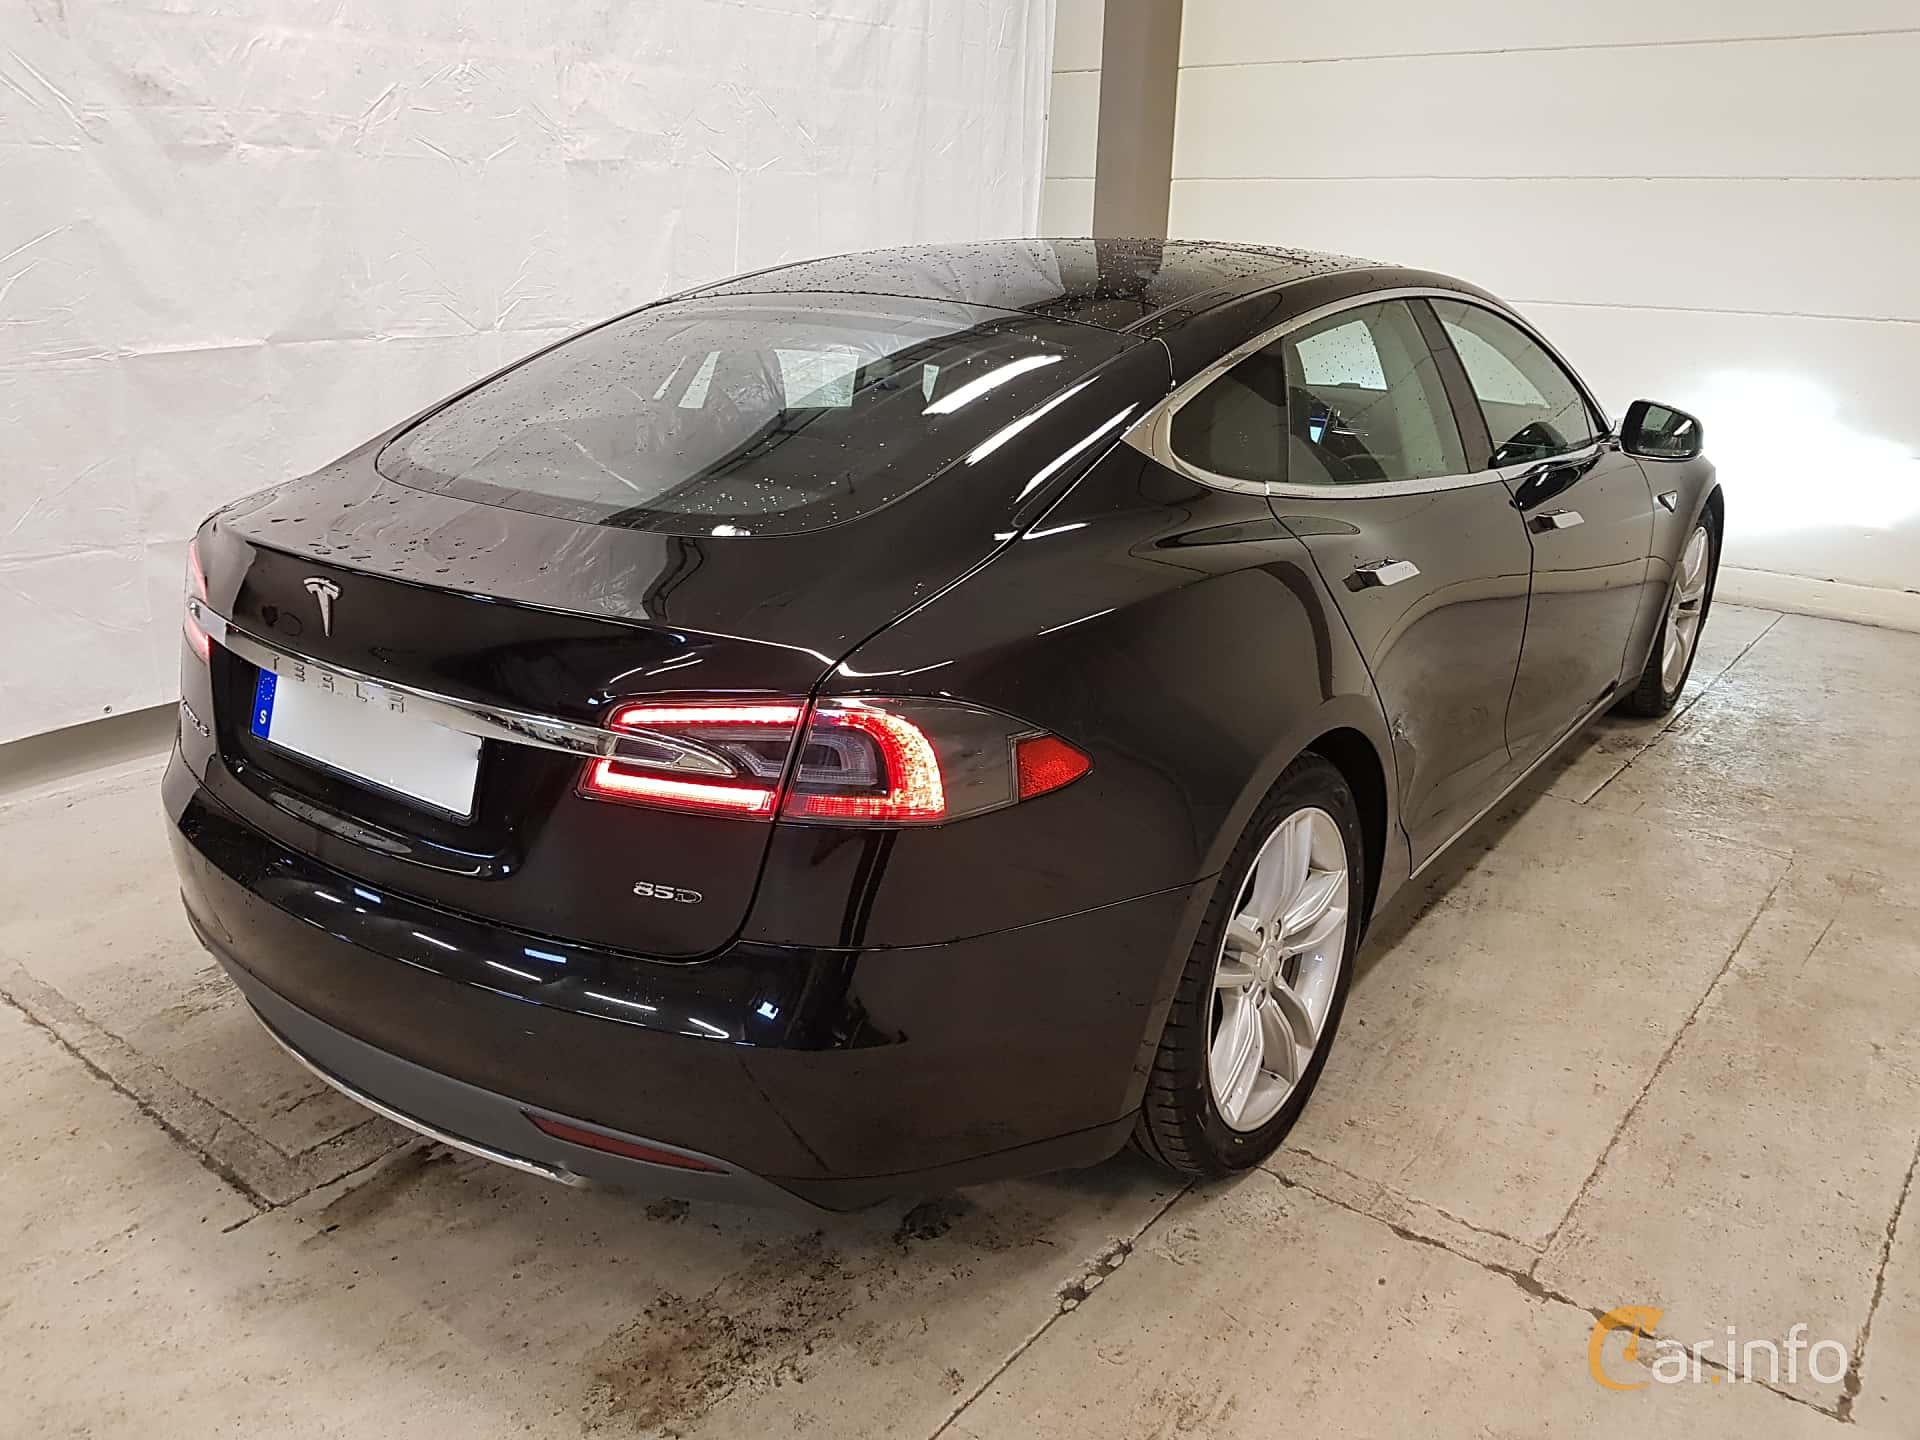 Tesla Model S 85D 85 kWh AWD Single Speed, 423hp, 2015